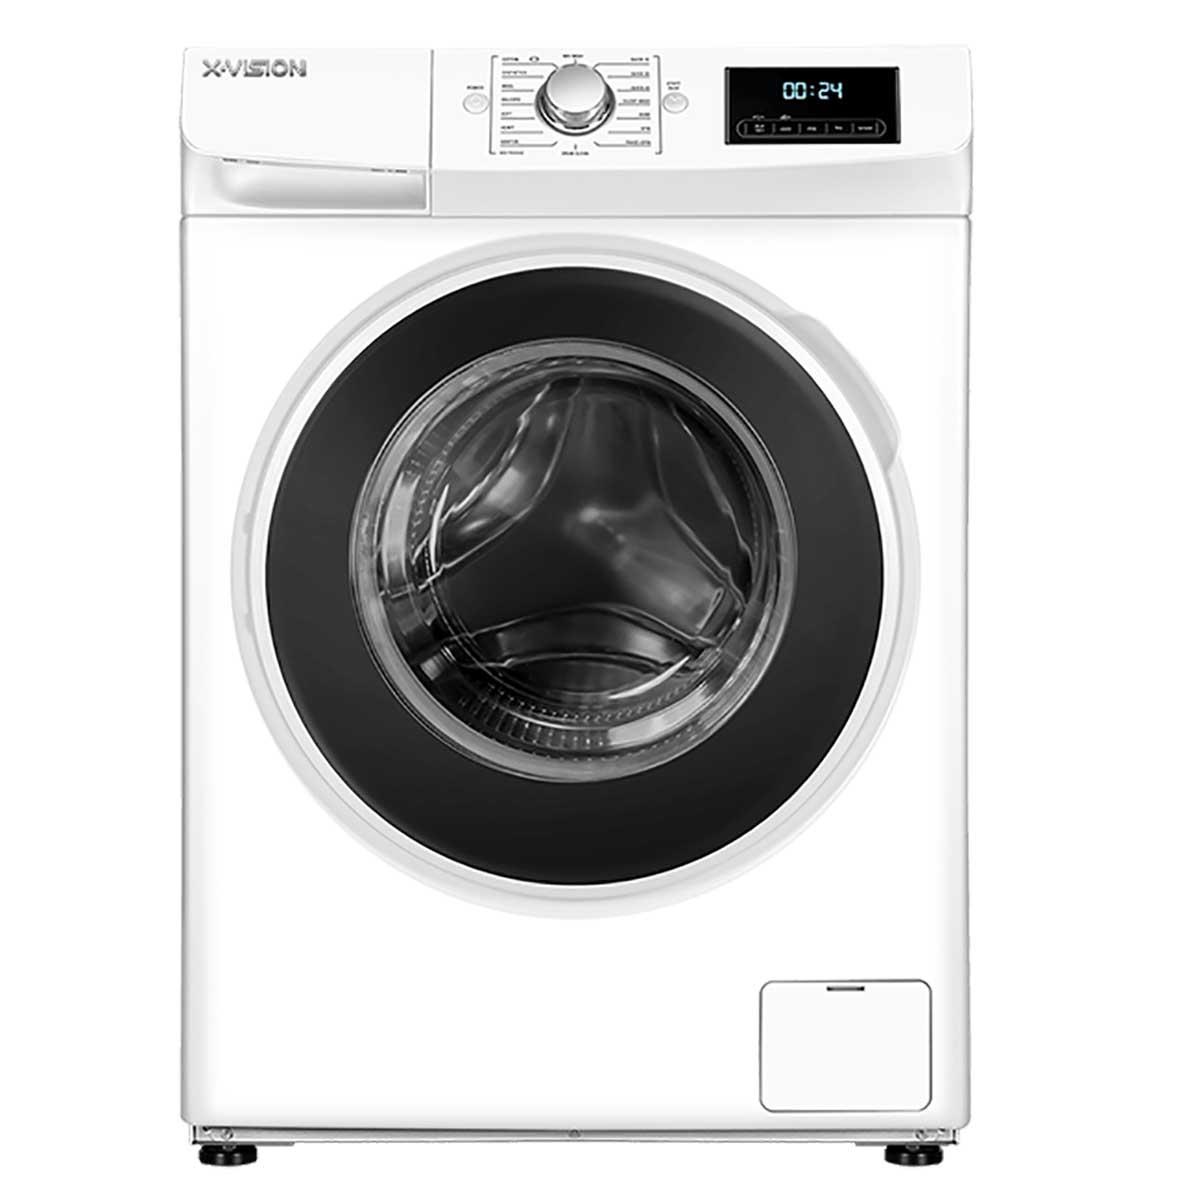 فروش نقدی و اقساطی ماشین لباسشویی ایکس ویژن مدل WA80-AW/AS ظرفیت 8 کیلوگرم